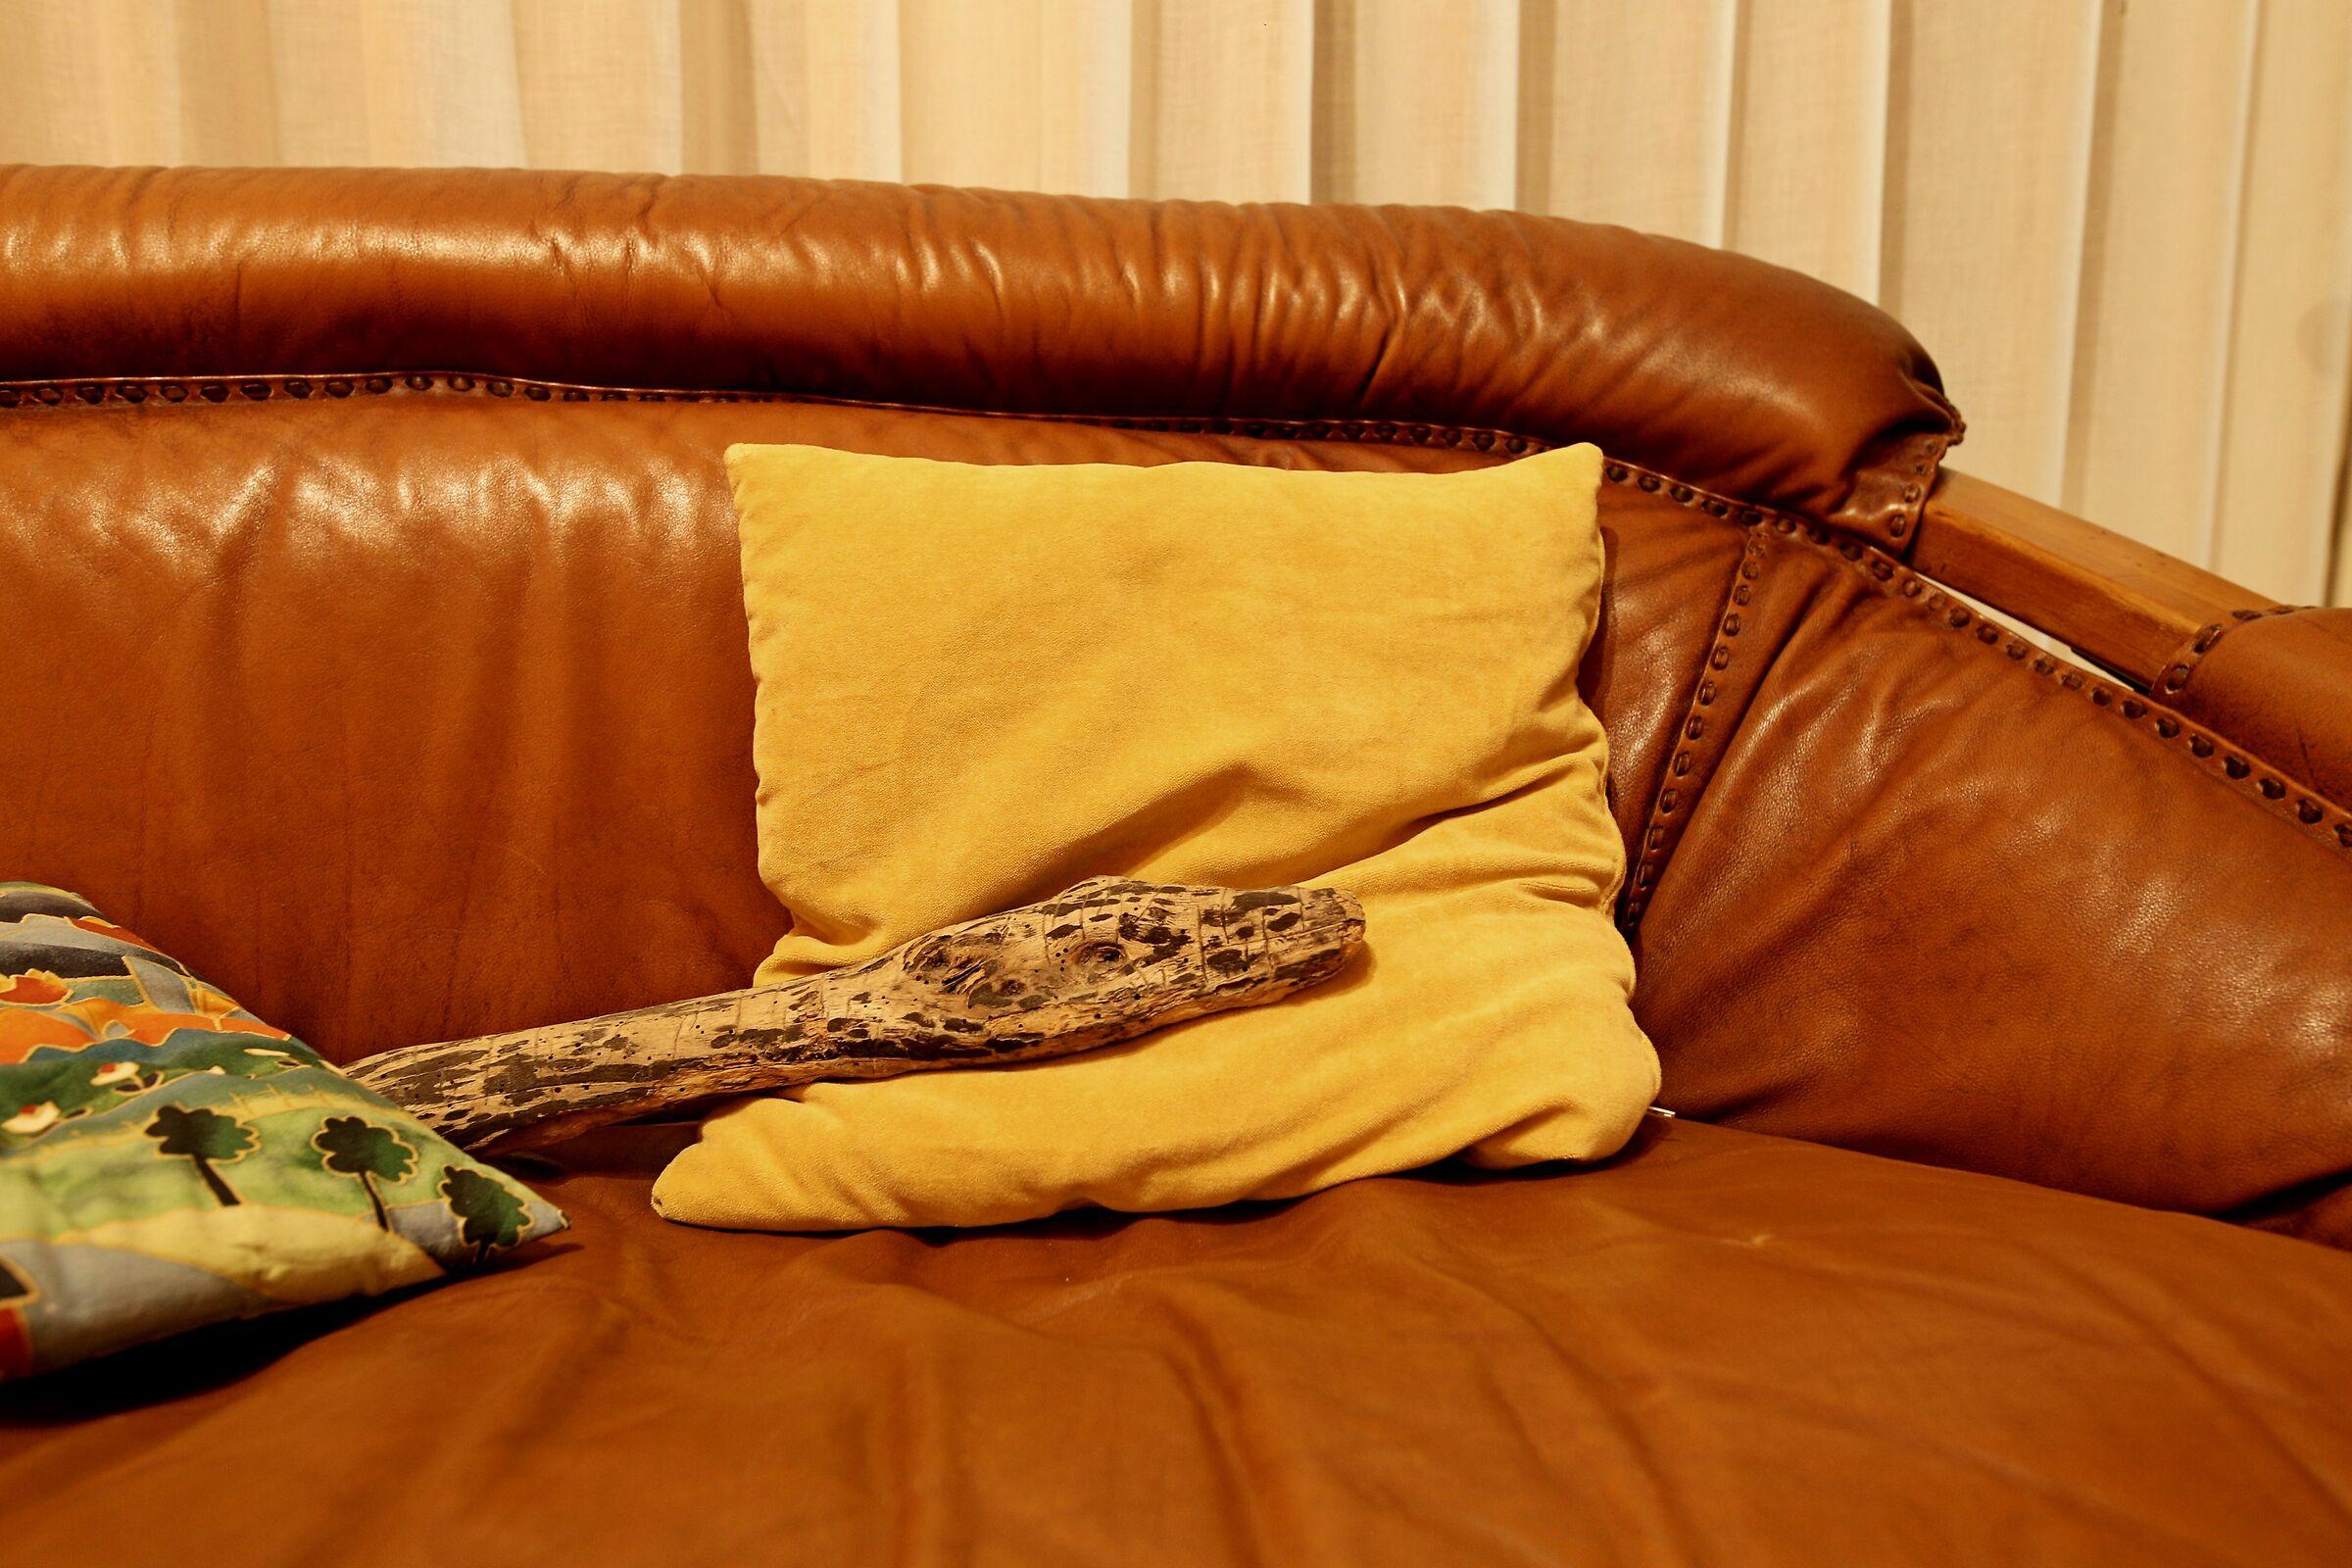 Una serpe in salotto...